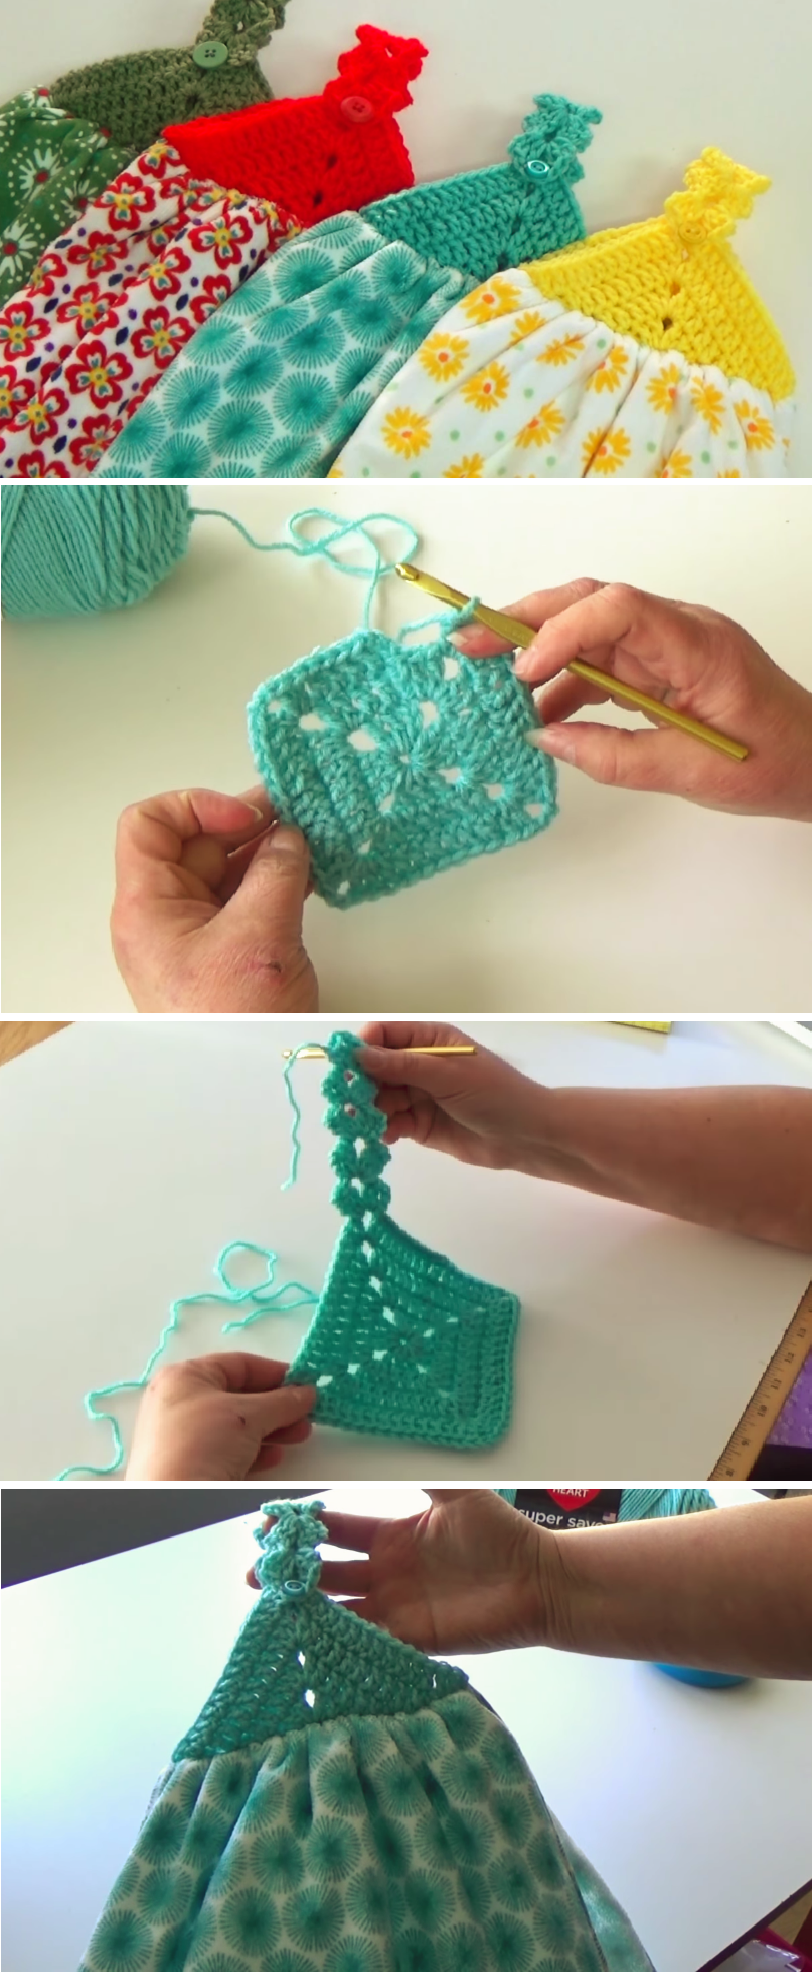 Crochet the Towel Topper | Crochet CP | Pinterest | Häkeln ...